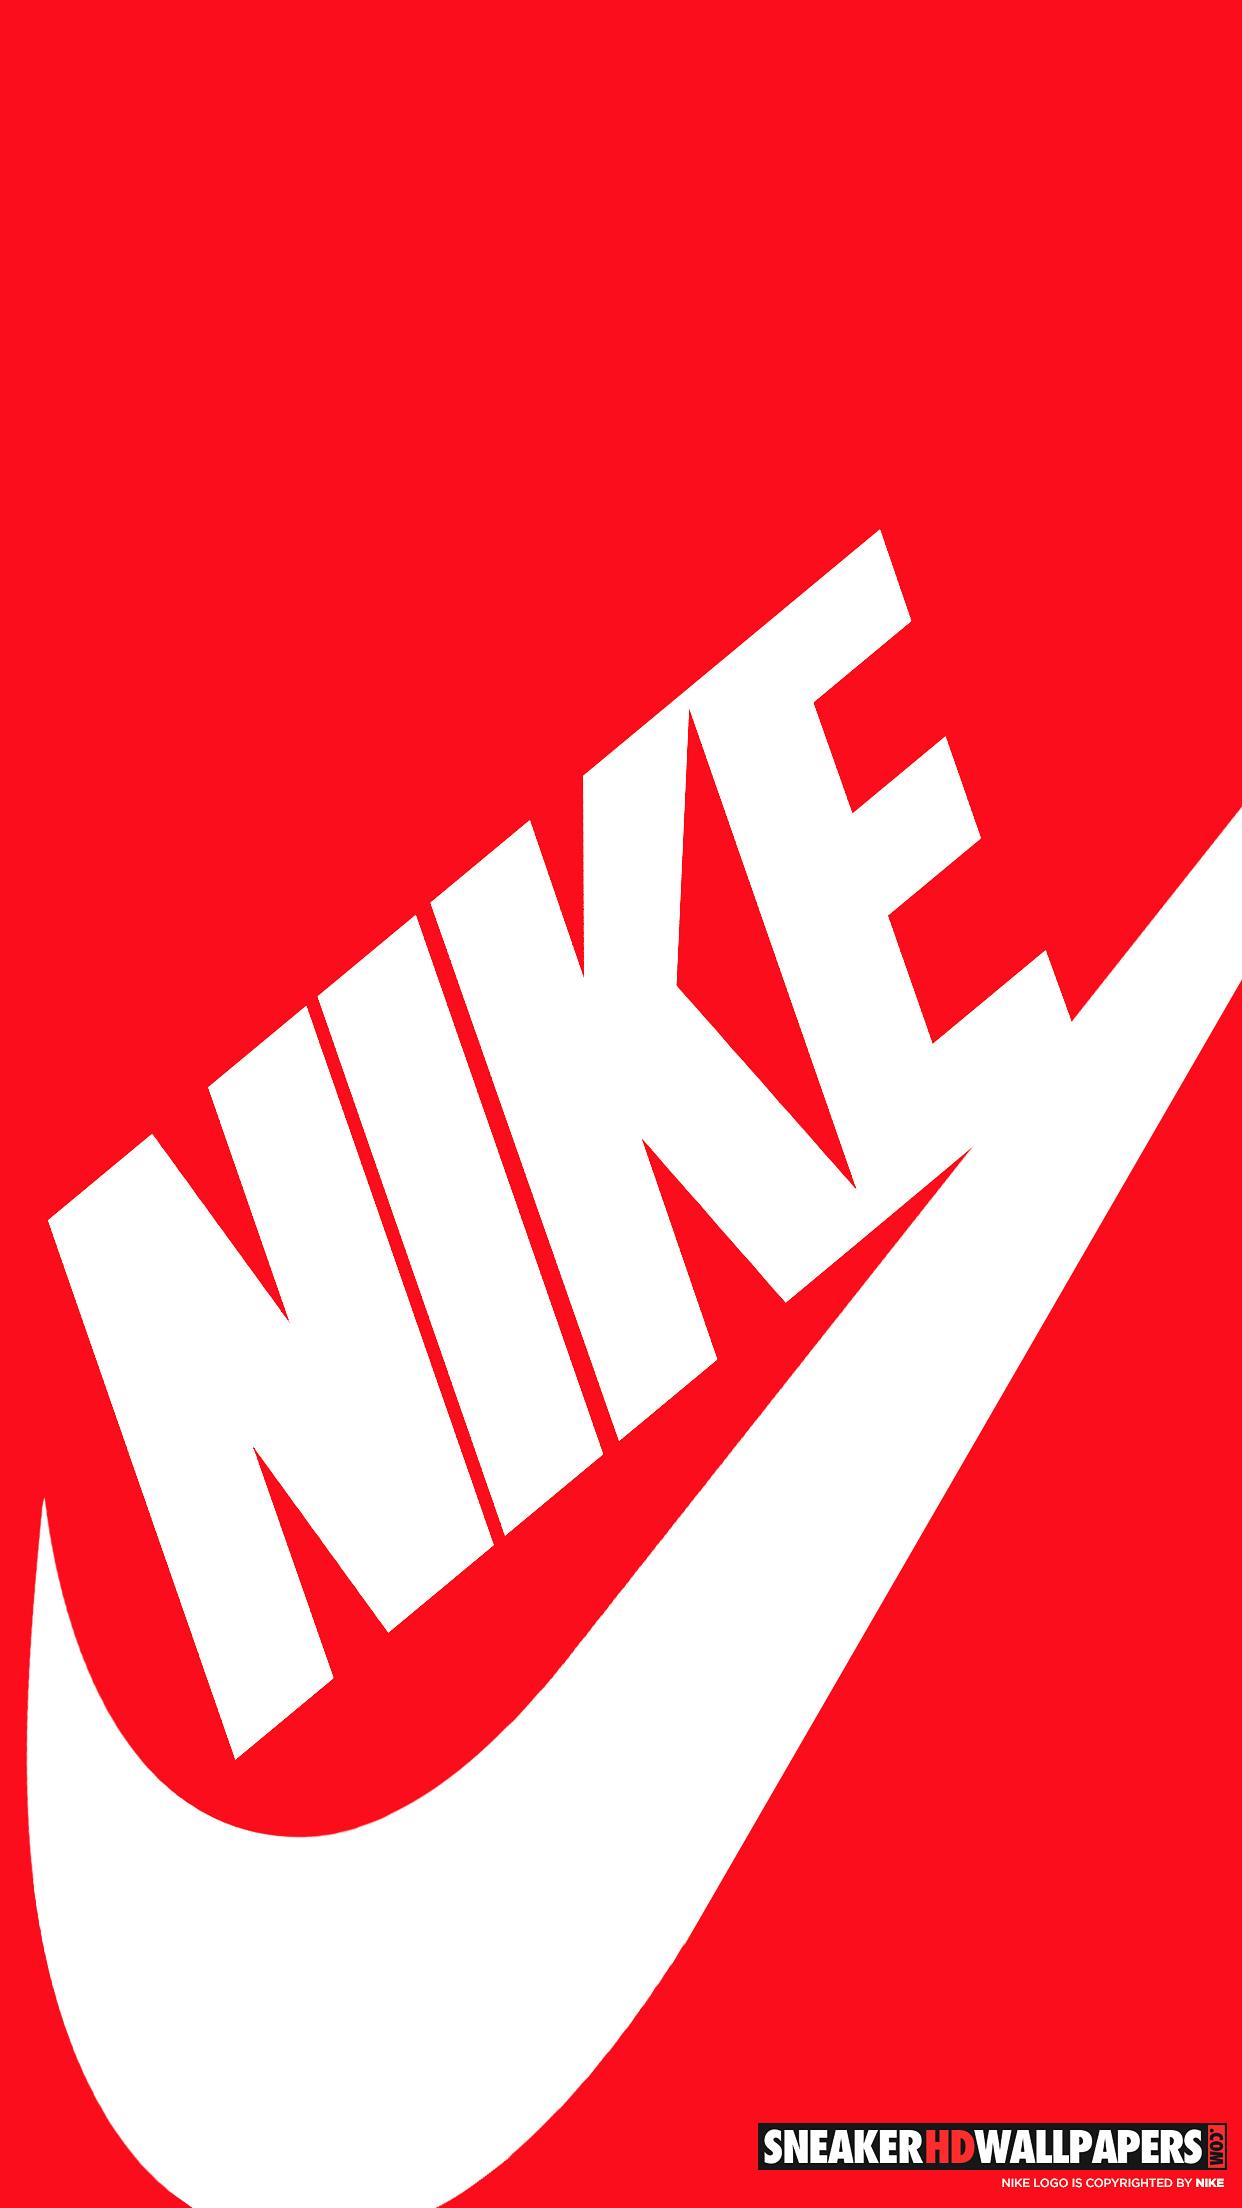 21+] Nike iPhone Wallpaper on WallpaperSafari